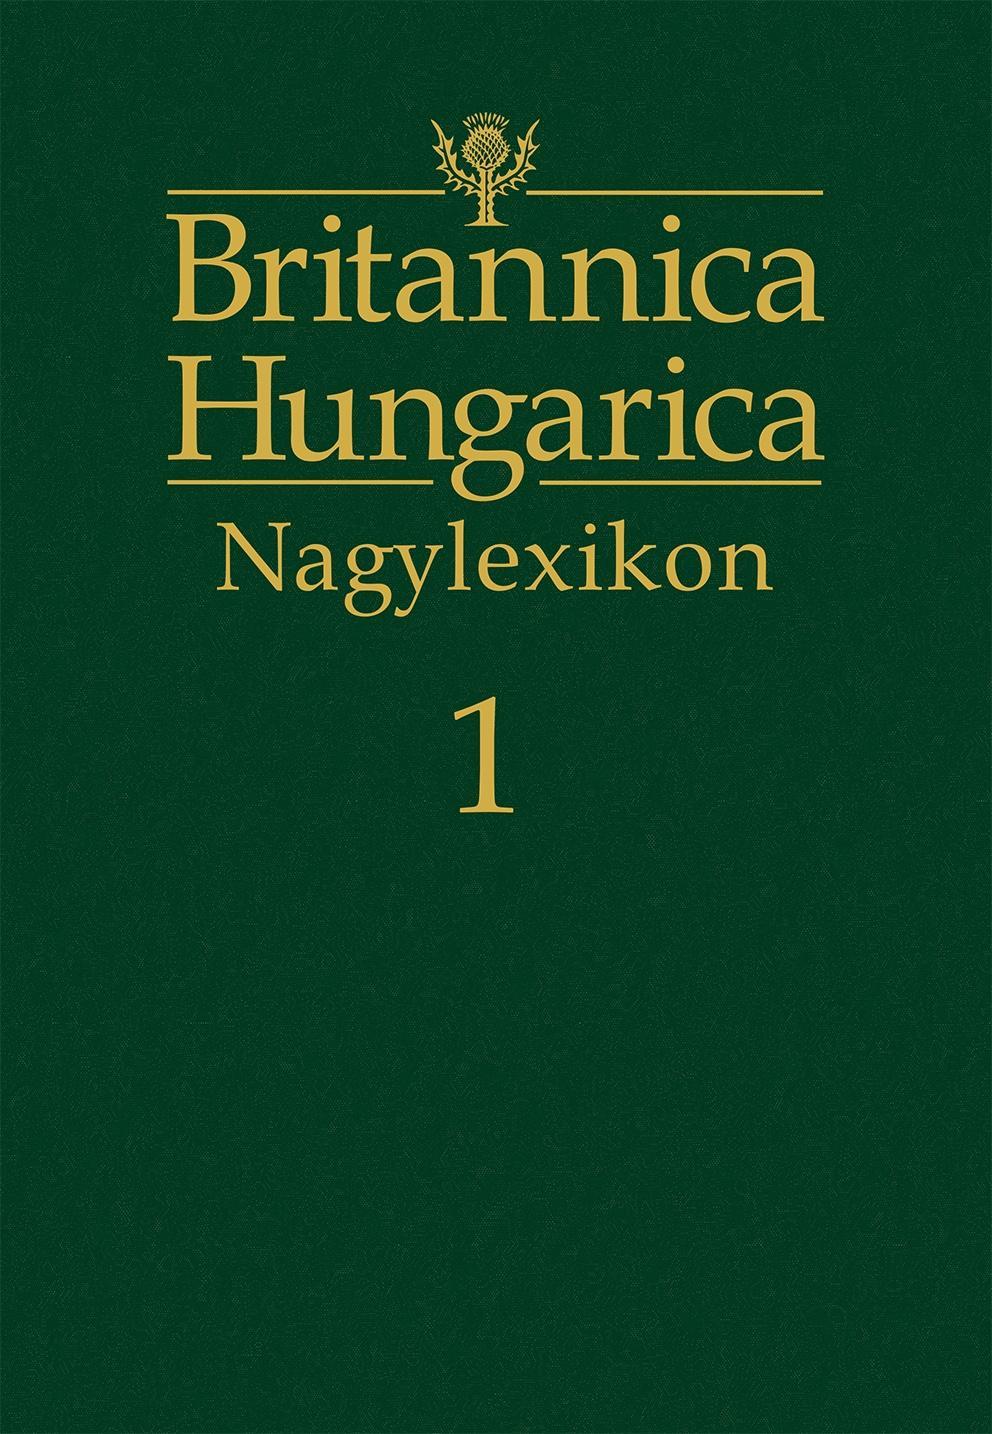 - - BRITANNICA HUNGARICA NAGYLEXIKON - 1.